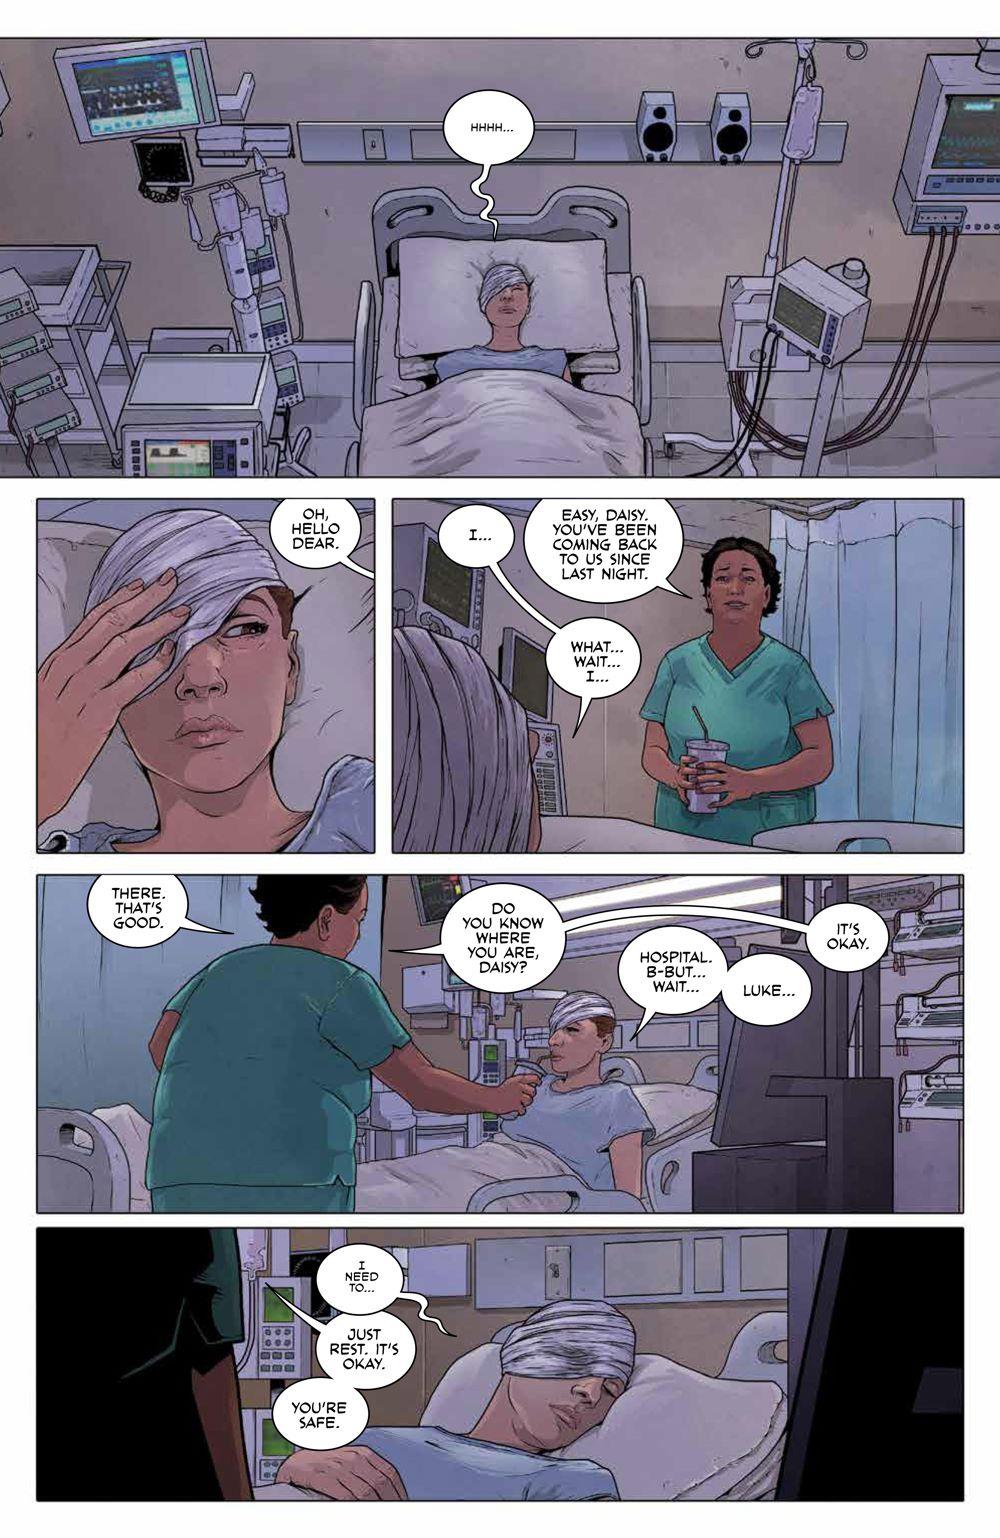 RedMother_v1_SC_PRESS_16 ComicList Previews: RED MOTHER VOLUME 1 TP